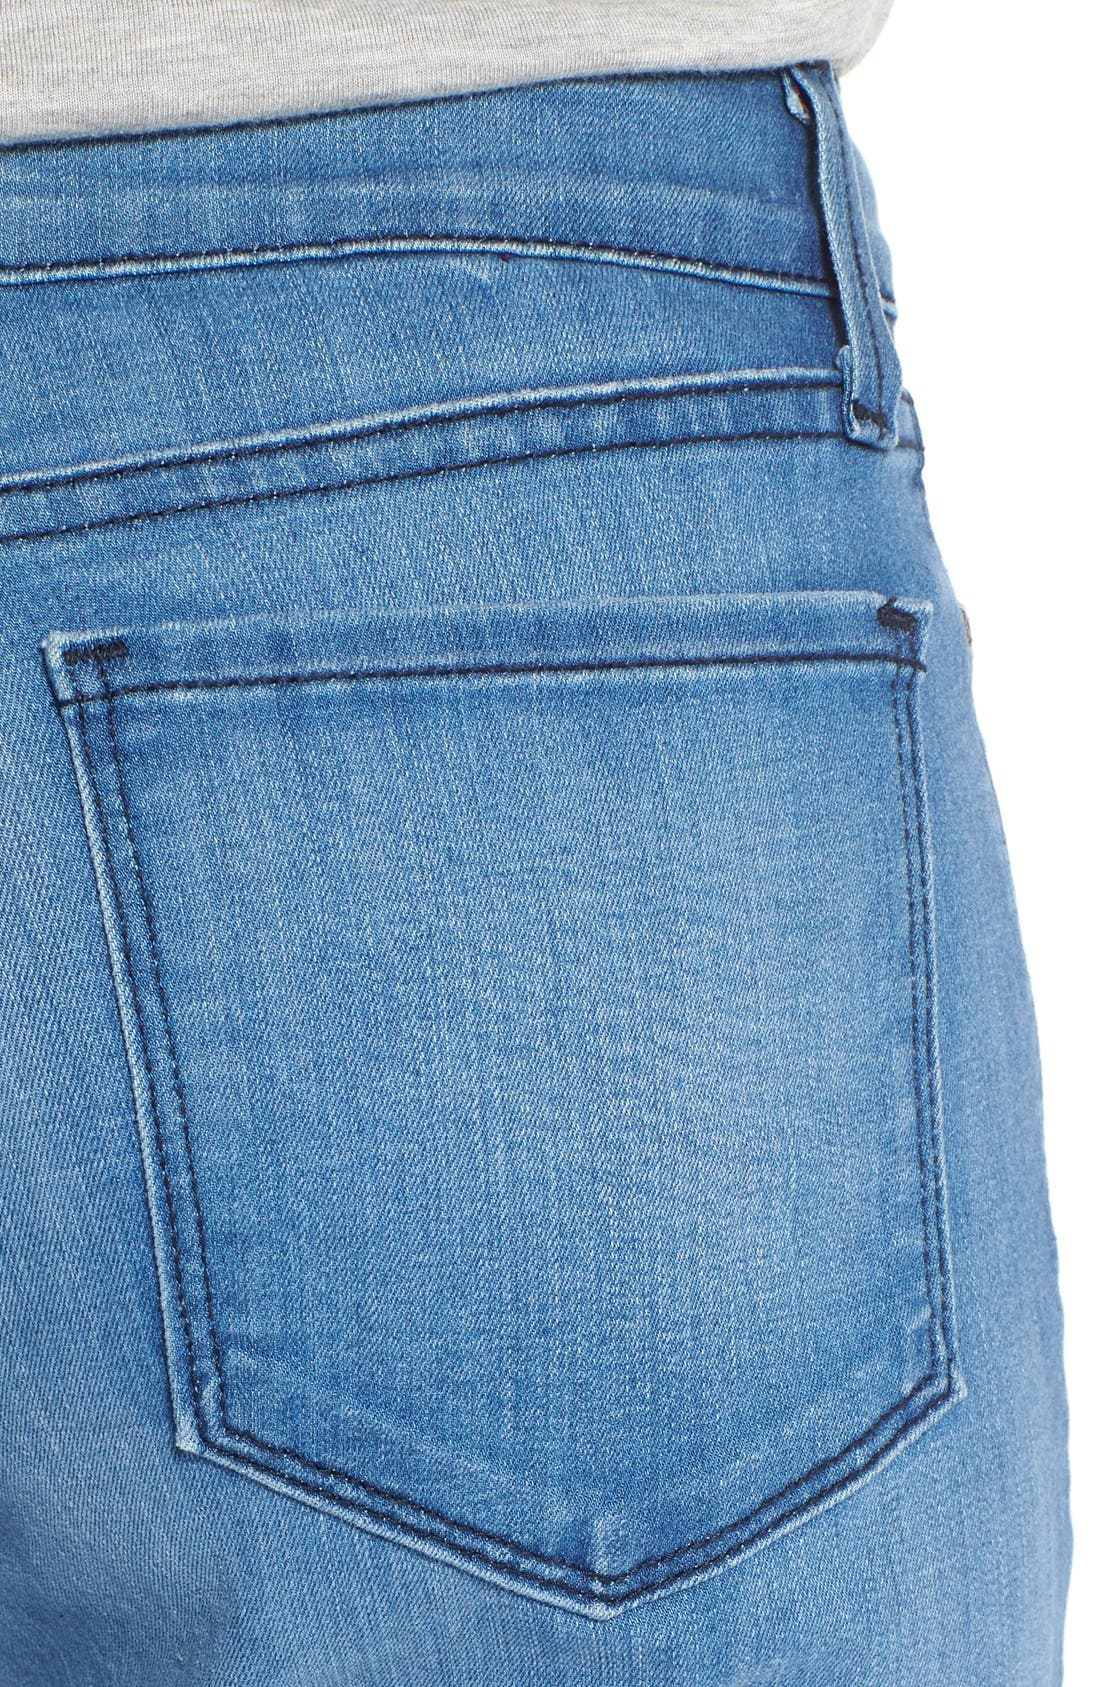 Alternate Image 4  - NYDJ 'Sheri' Stretch Skinny Jeans (Newberry)